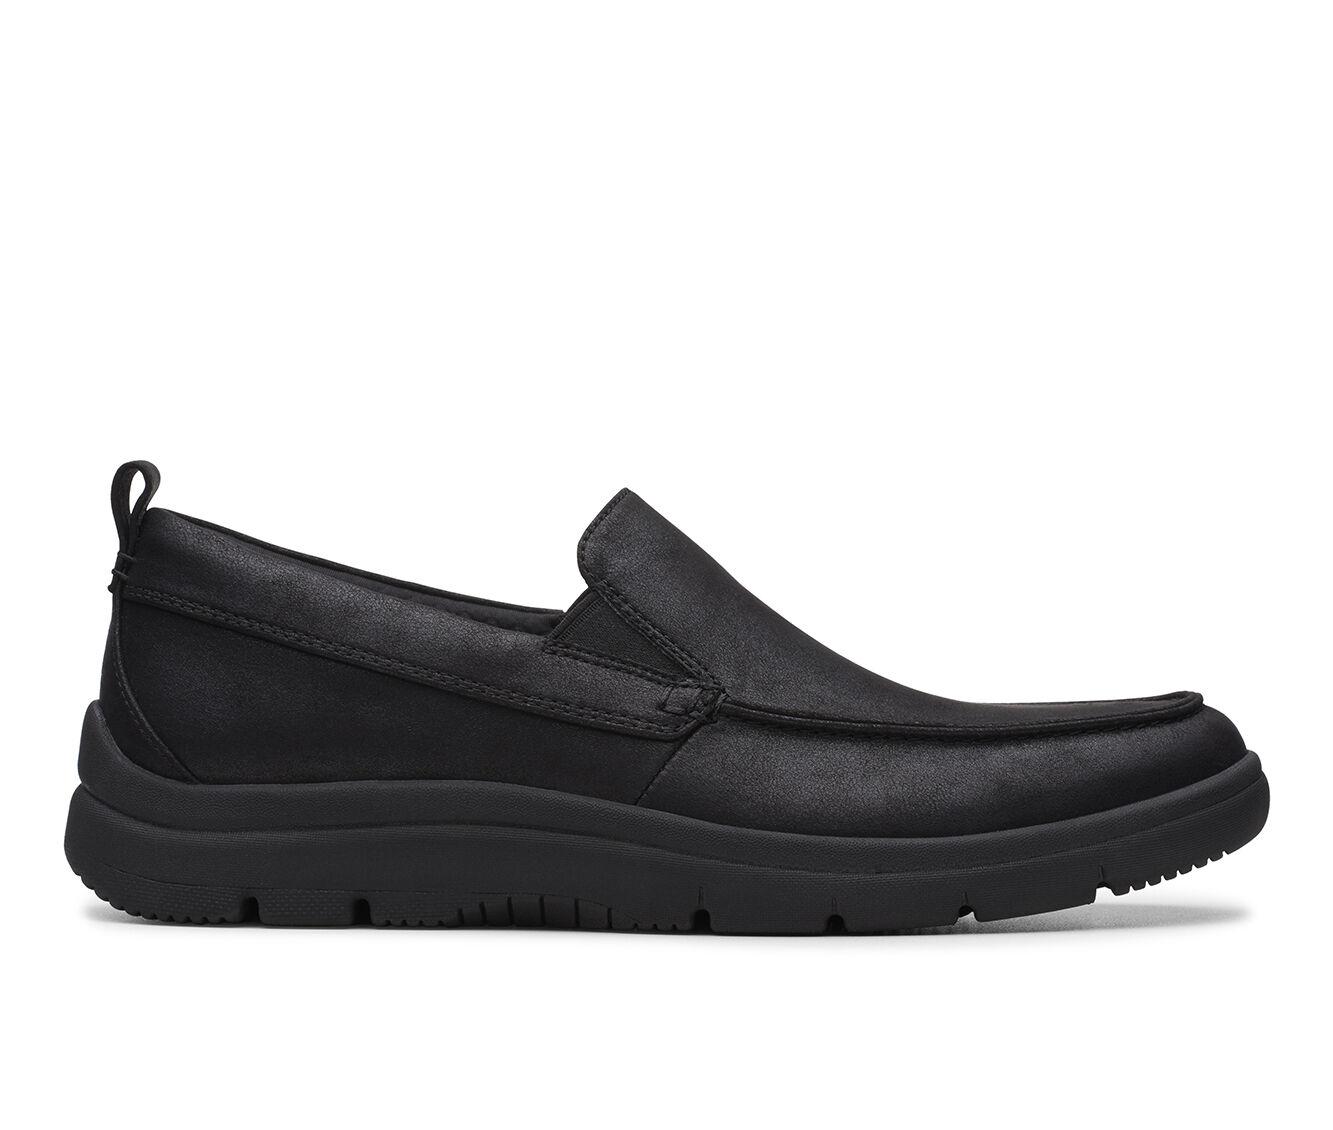 Men's Clarks Tunsil Way Slip-On Shoes Black